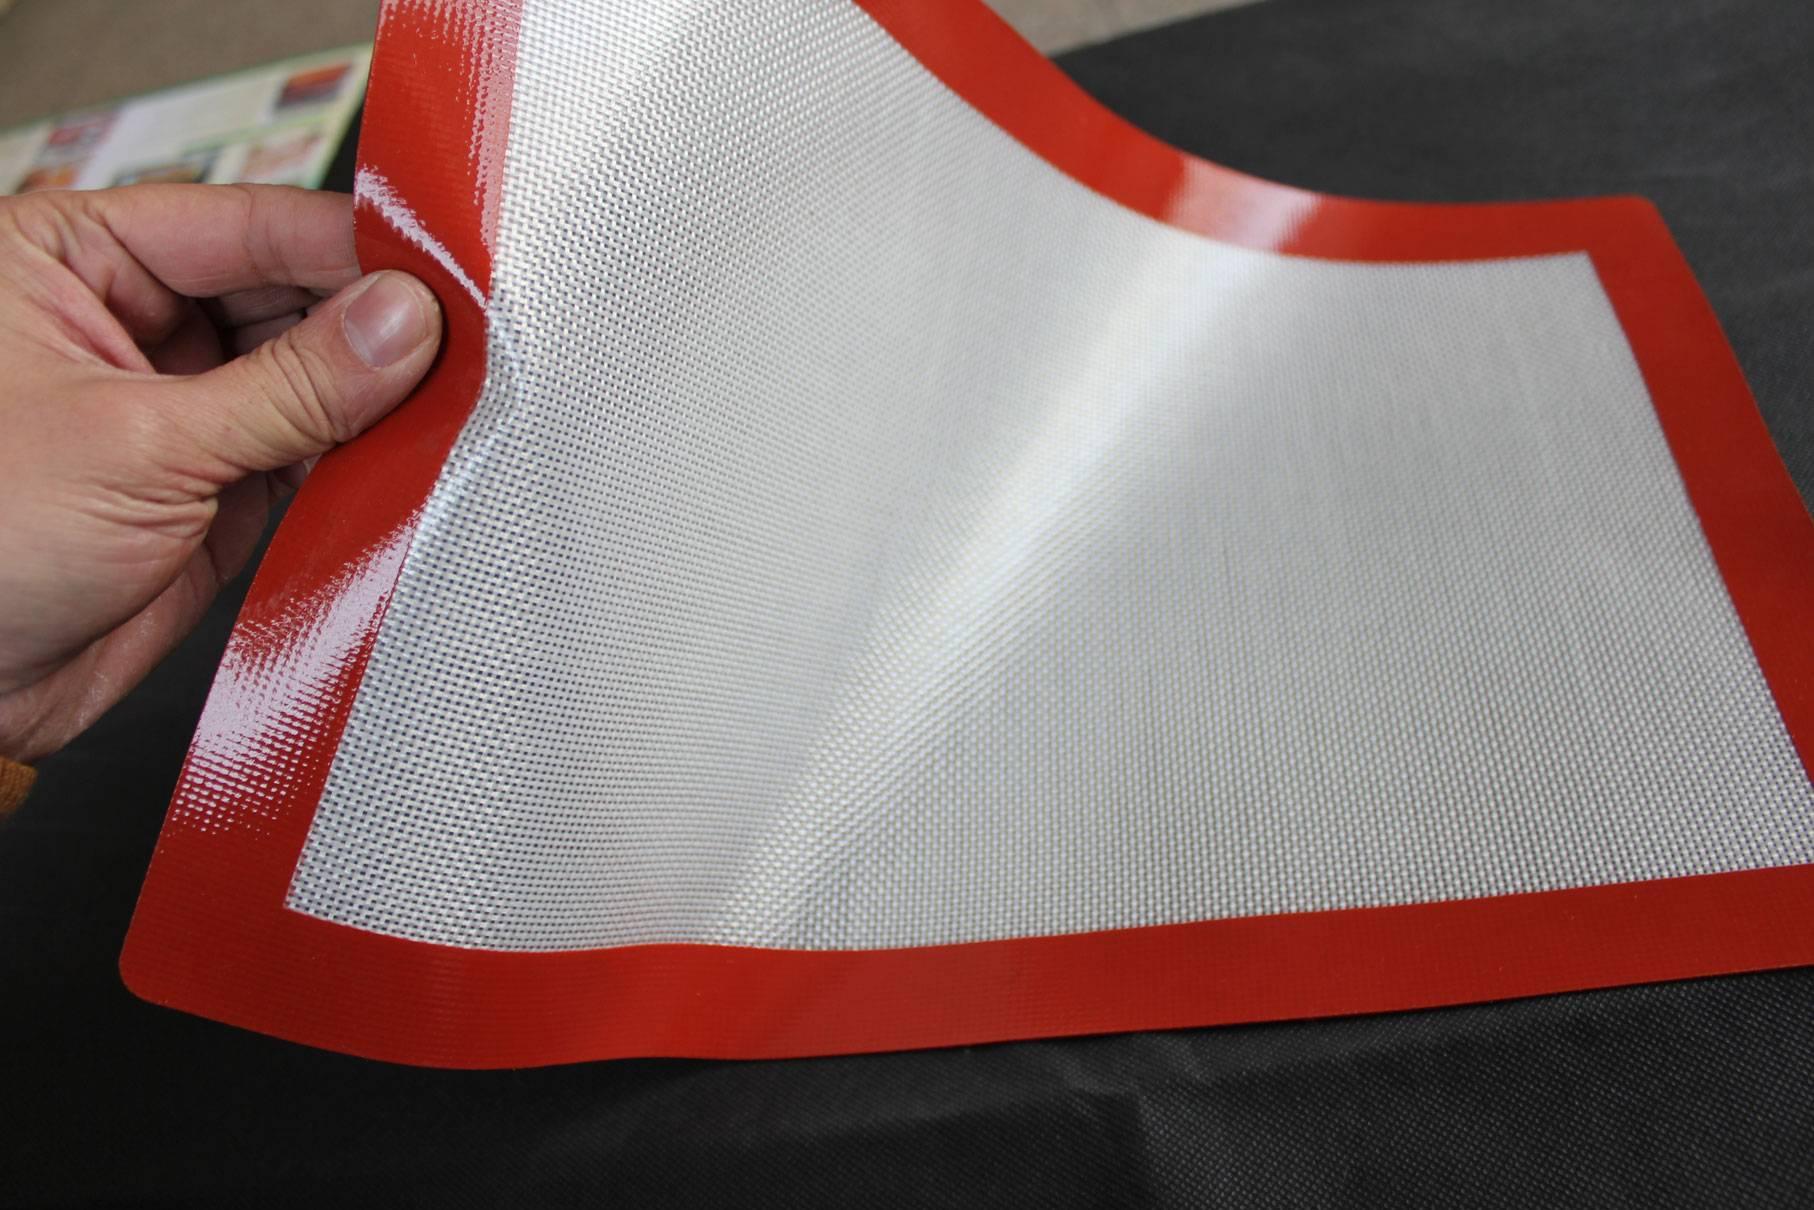 fiberglass silicone kitchen mat